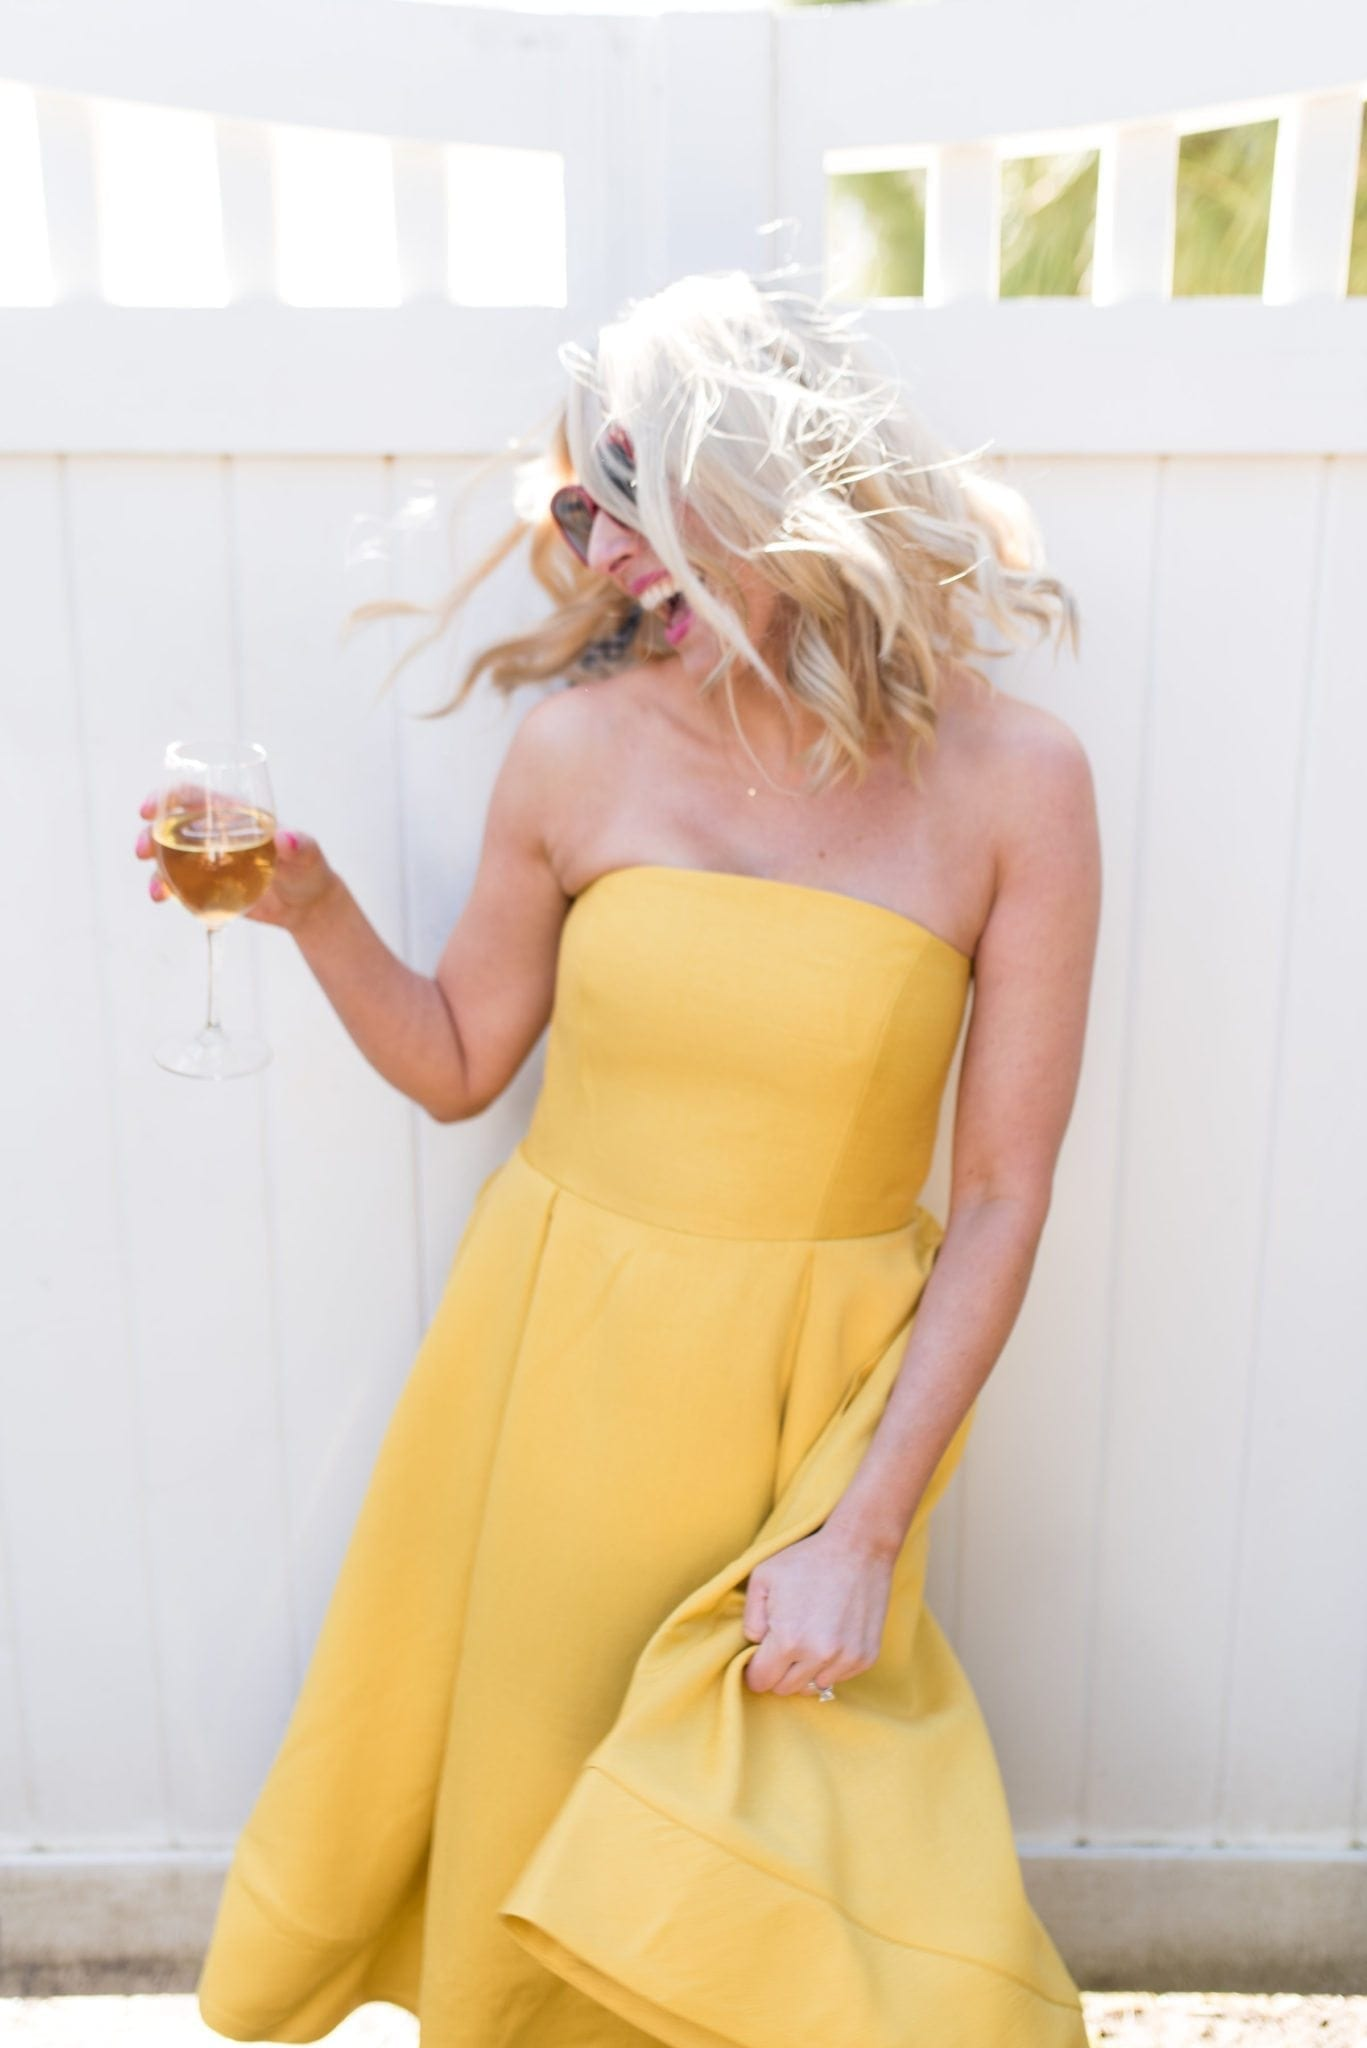 Strapless Yellow dress with full skirt. Red sunglasses.